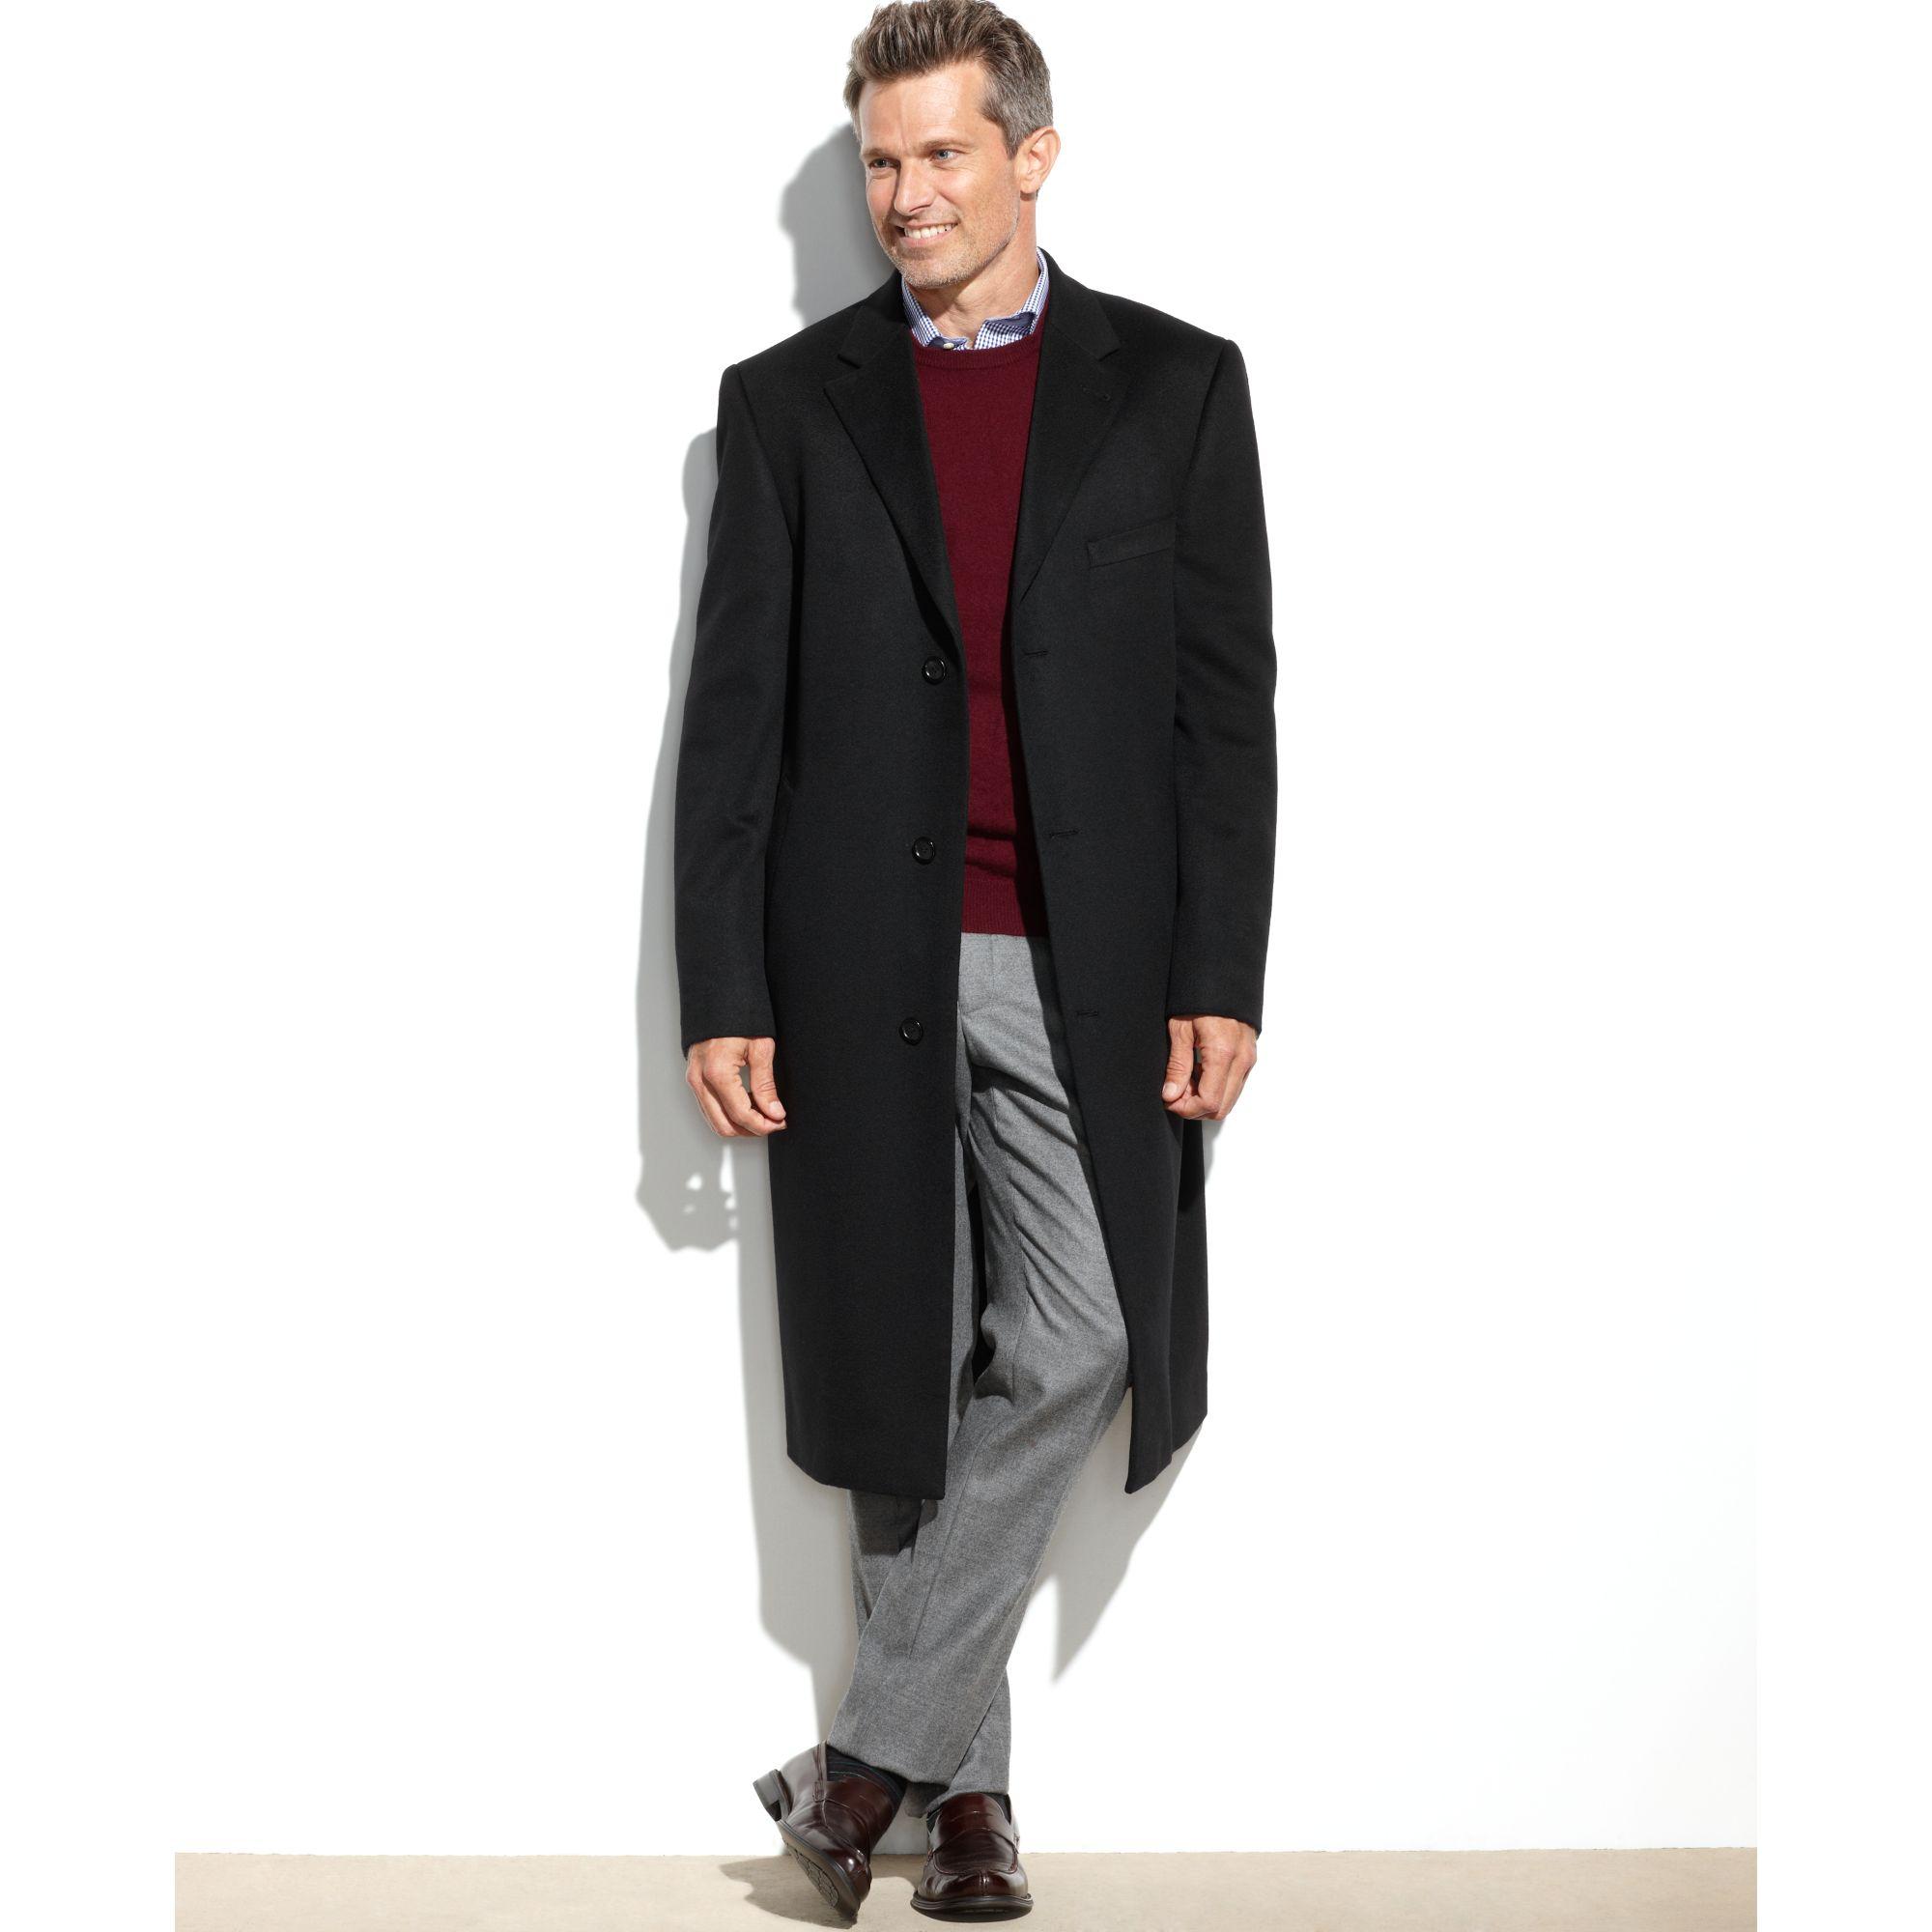 lauren by ralph lauren columbia cashmere blend overcoat in black for men lyst. Black Bedroom Furniture Sets. Home Design Ideas